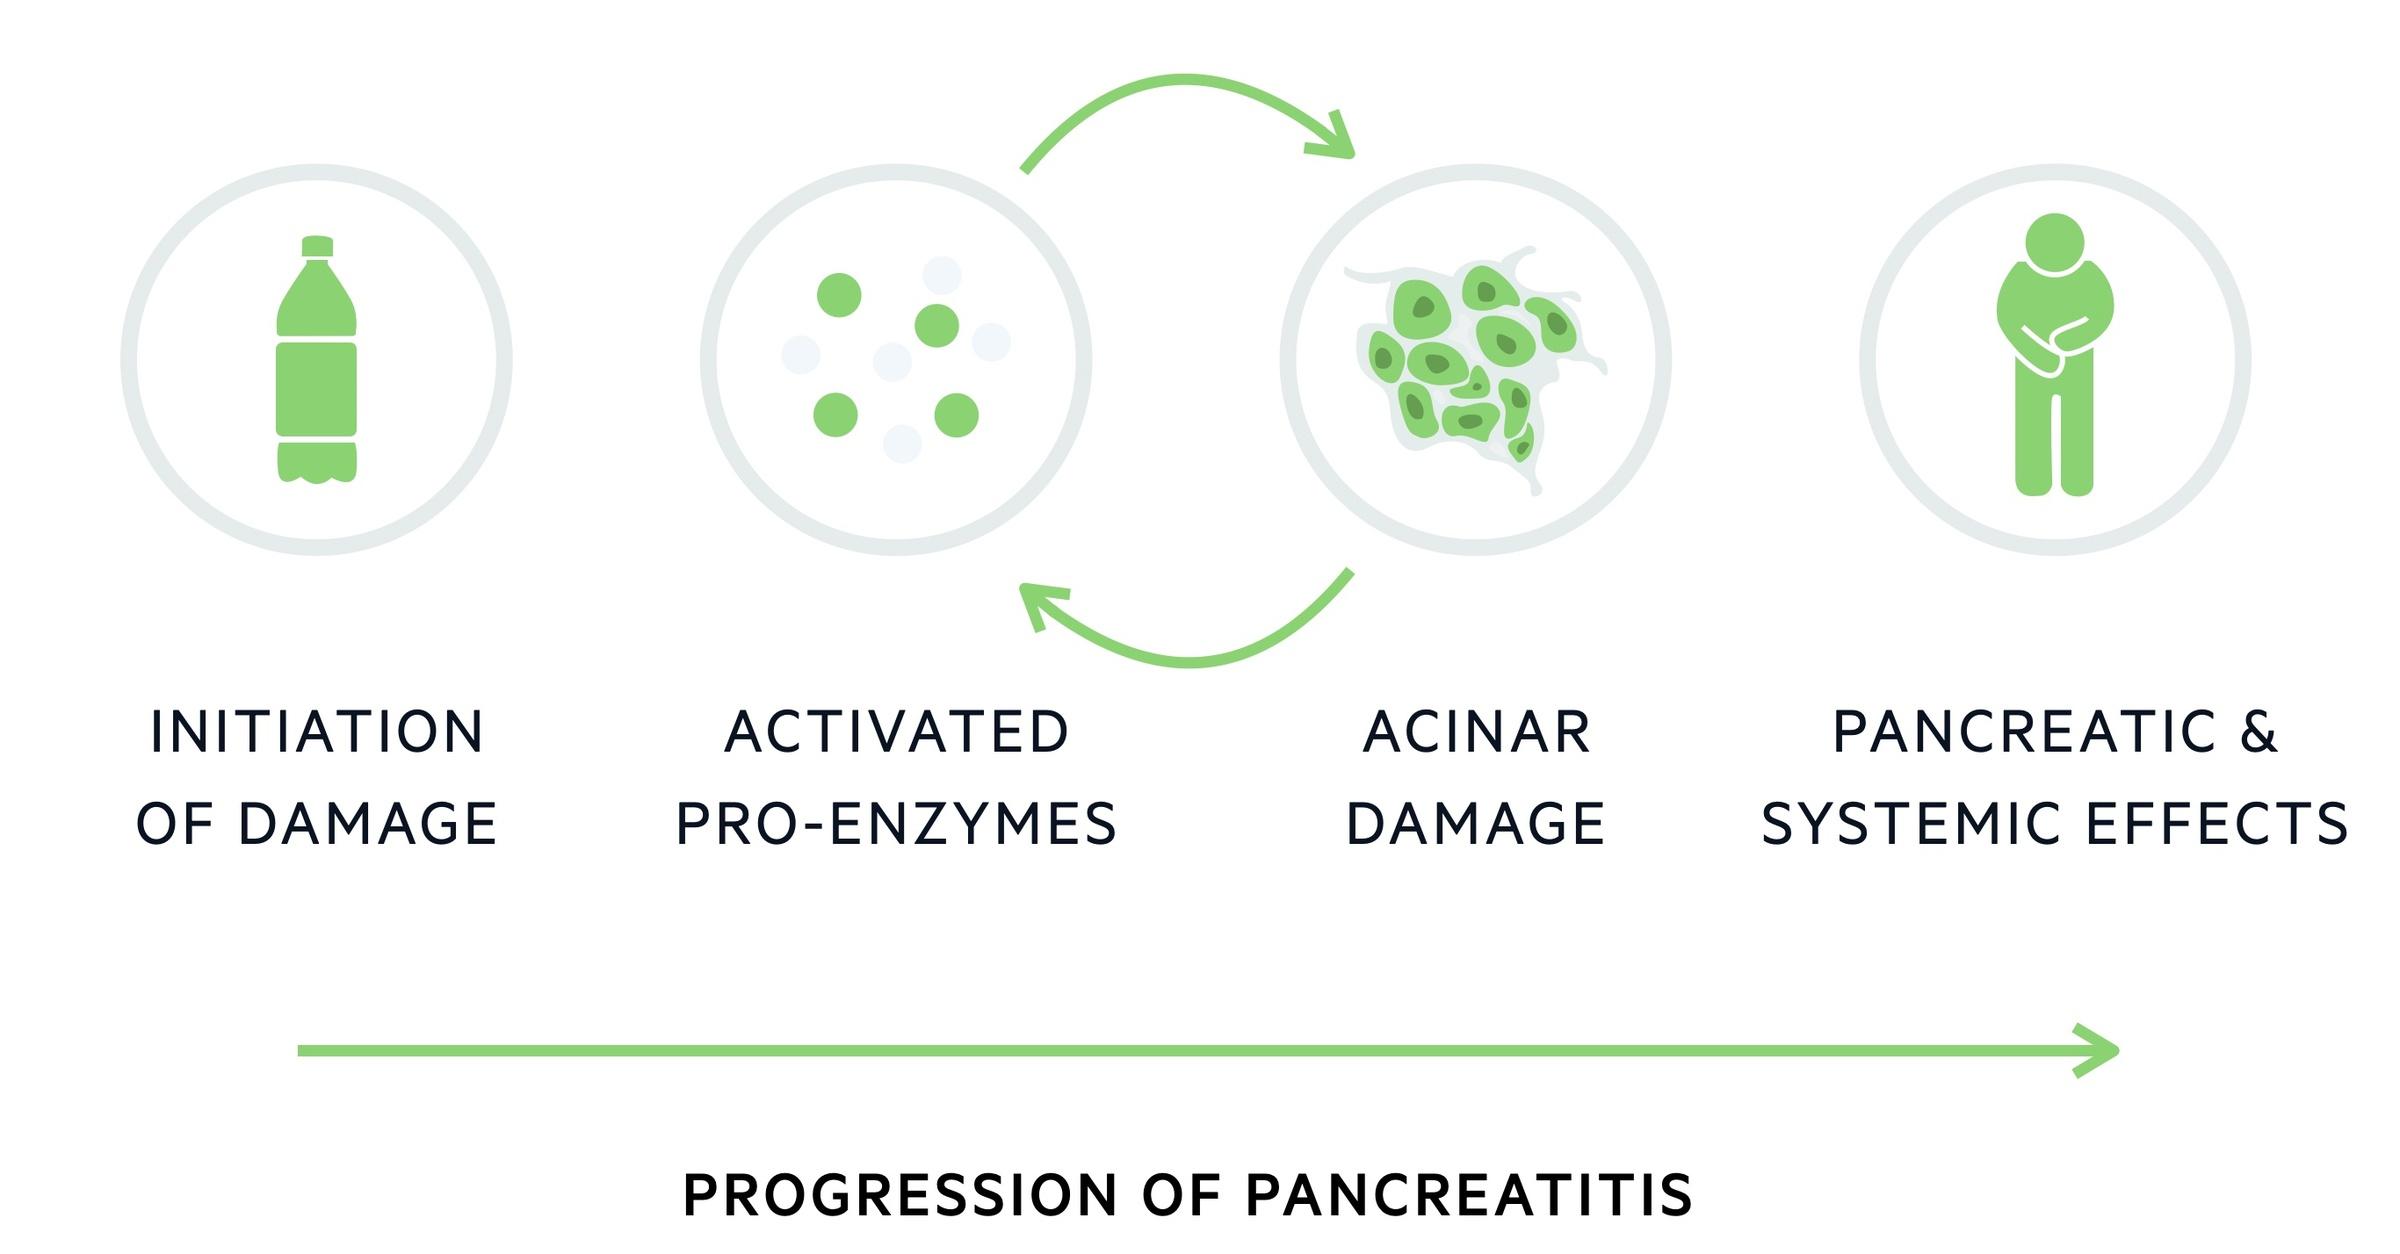 Progression of acute pancreatitis